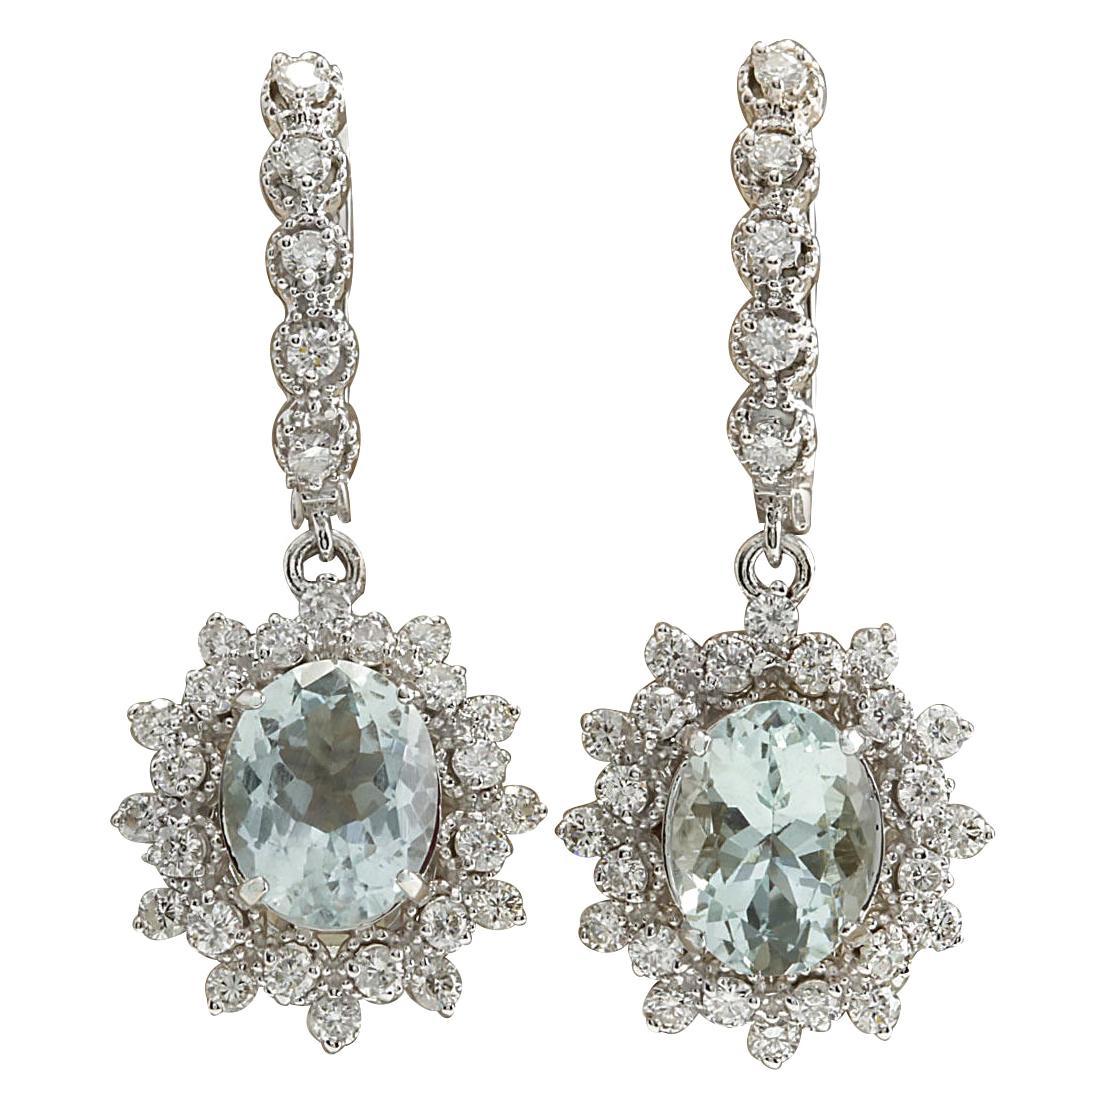 6.40 Carat Natural Aquamarine 18 Karat White Gold Diamond Earrings